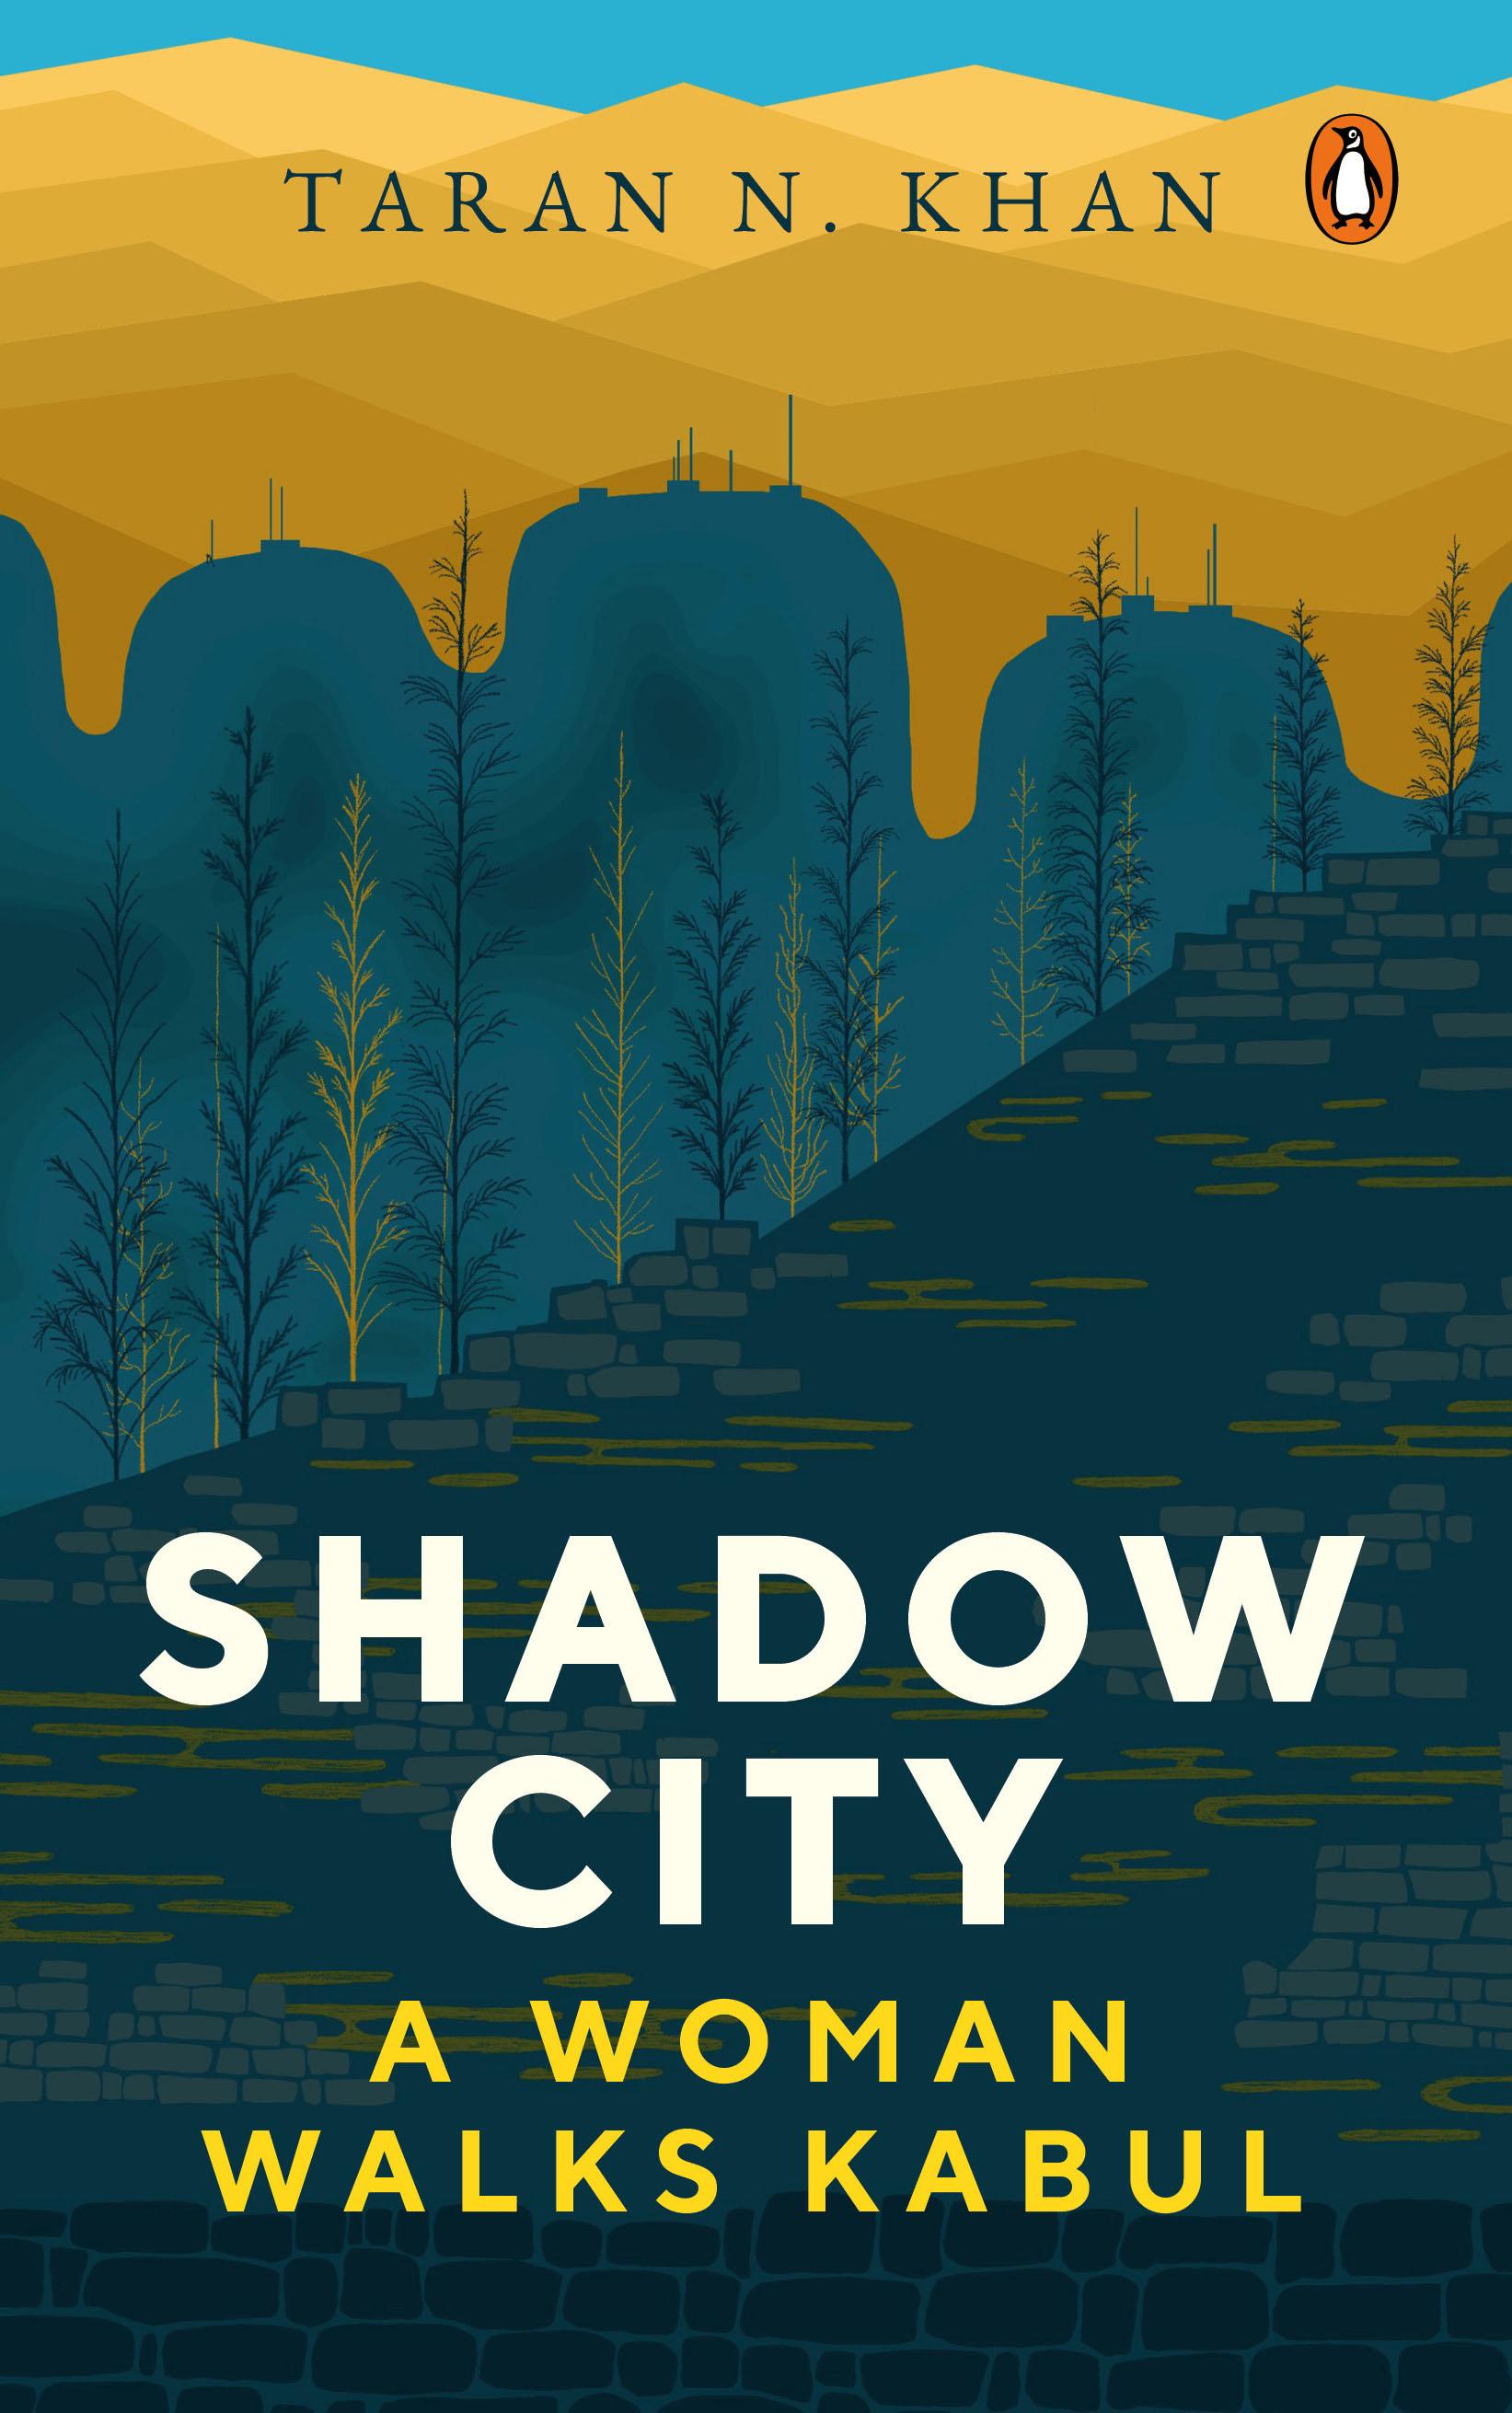 Taran Khan book Shadow City